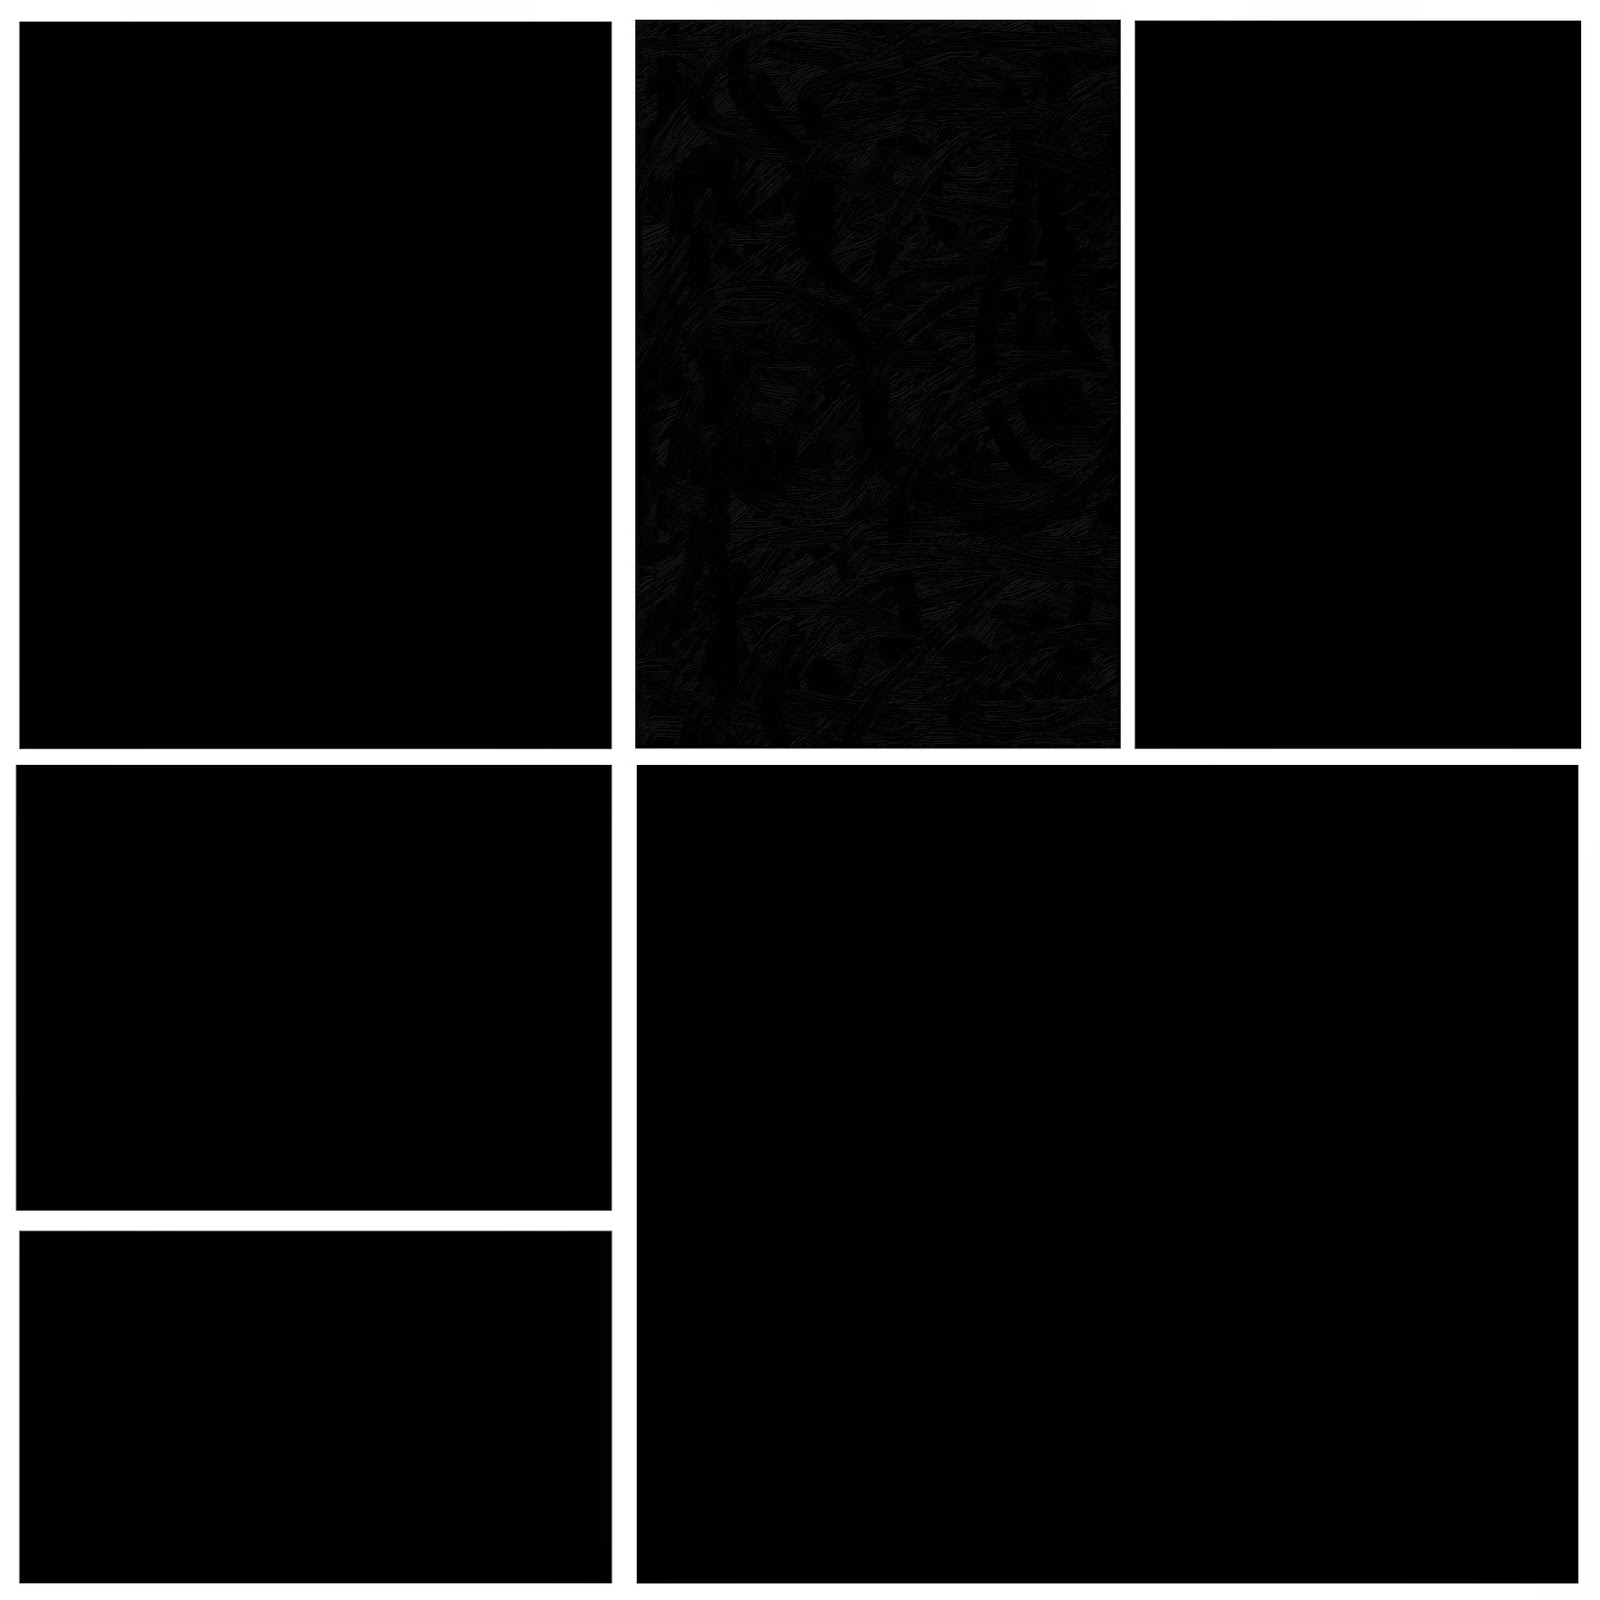 http://4.bp.blogspot.com/-yLc4eHrEwVA/VFAP1uq60vI/AAAAAAAAOPg/k-XmO39ui6A/s1600/KK_SS_template_grid.jpg